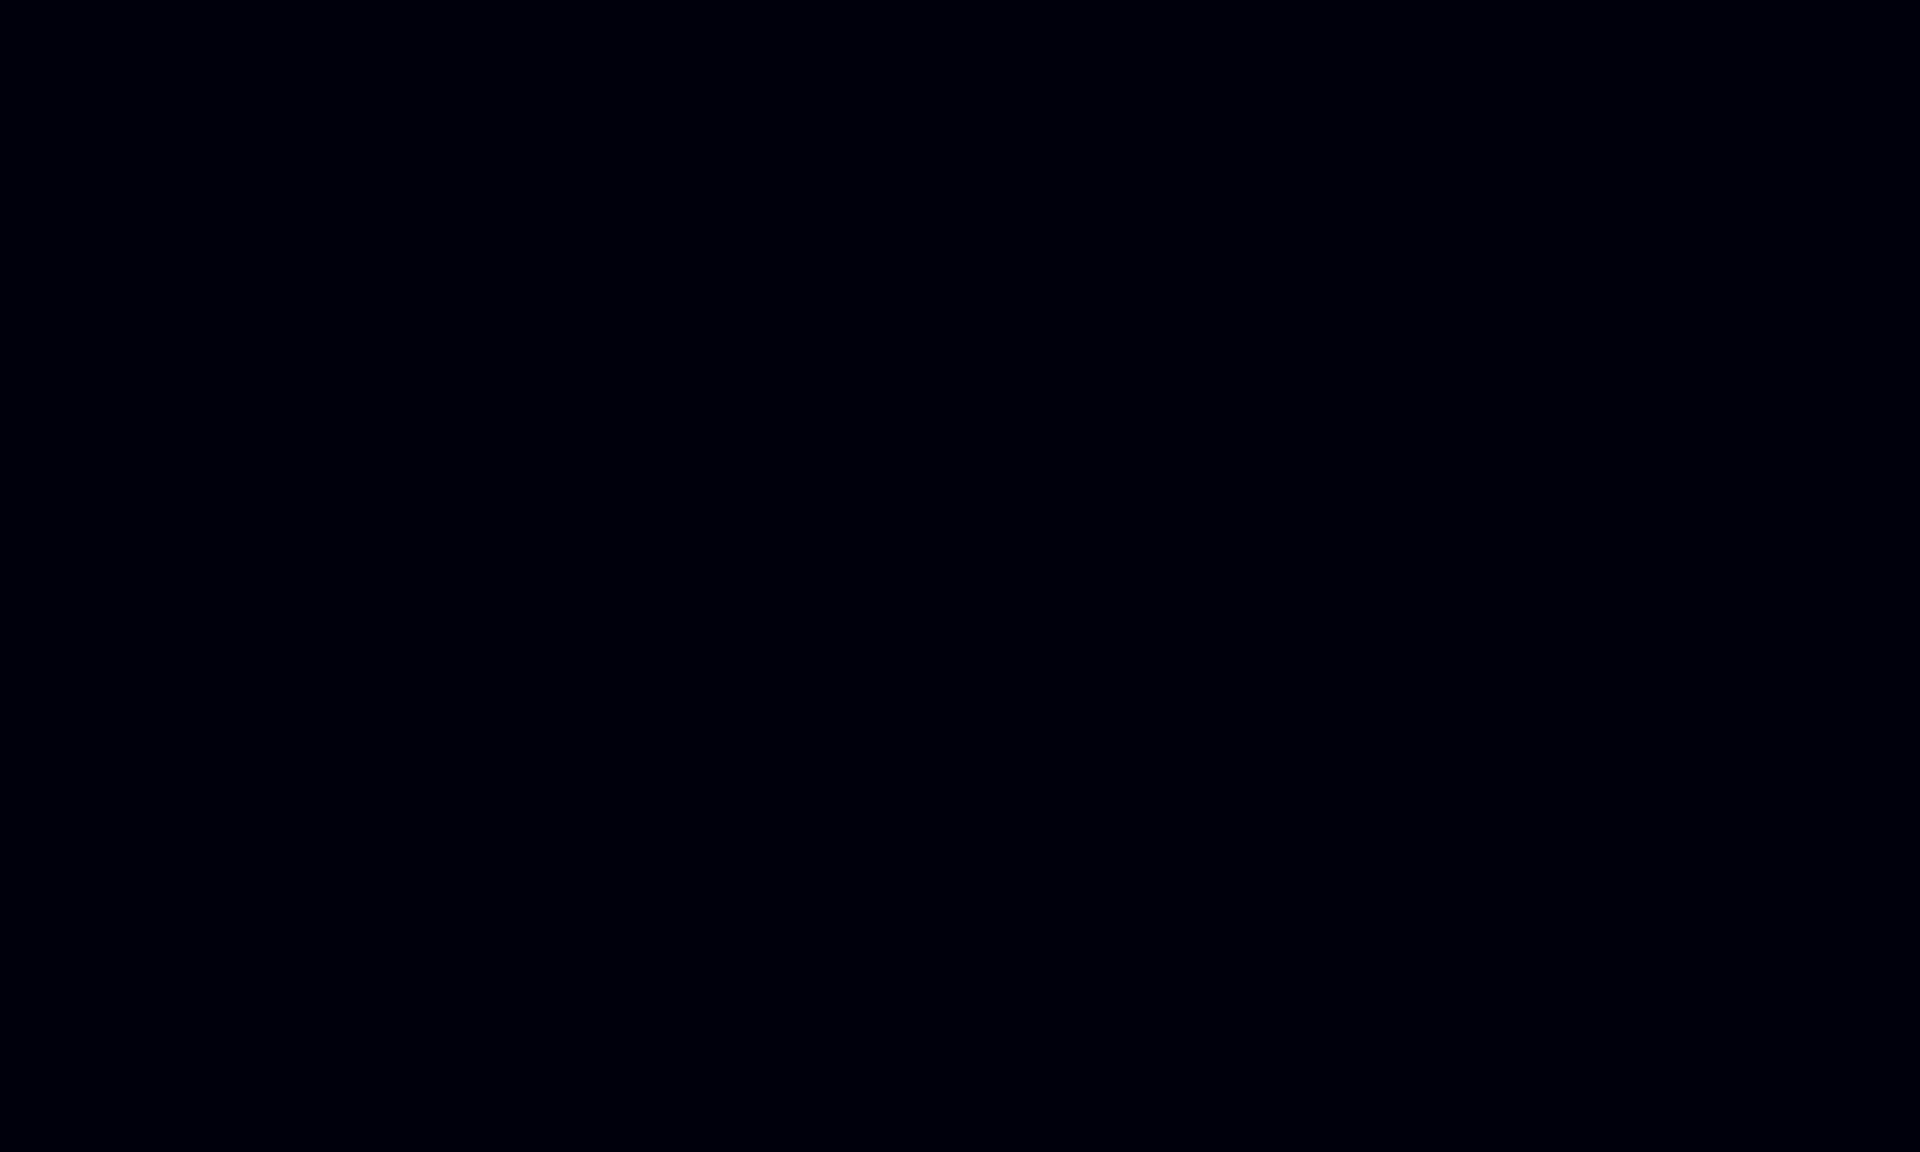 png-layer-transperant-blk-15